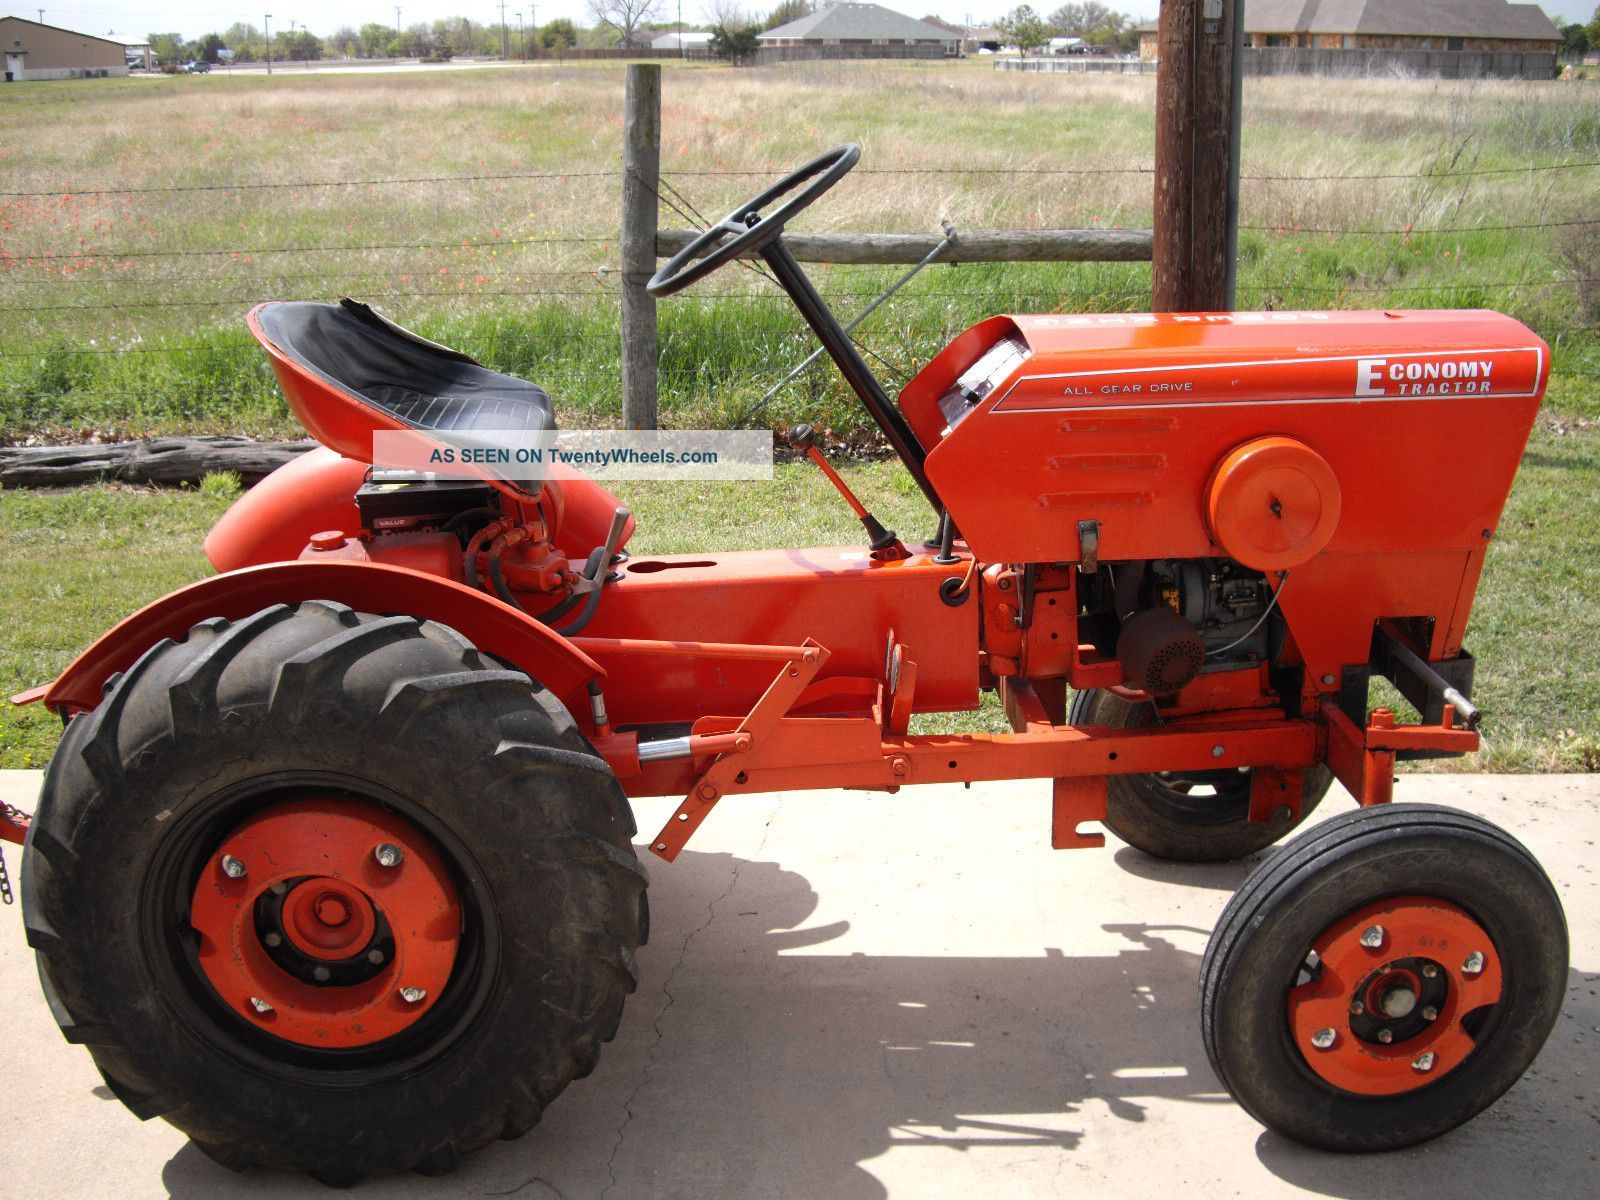 1940 9n ford tractor wiring diagram 95 jeep grand cherokee radio rear wheel bing images